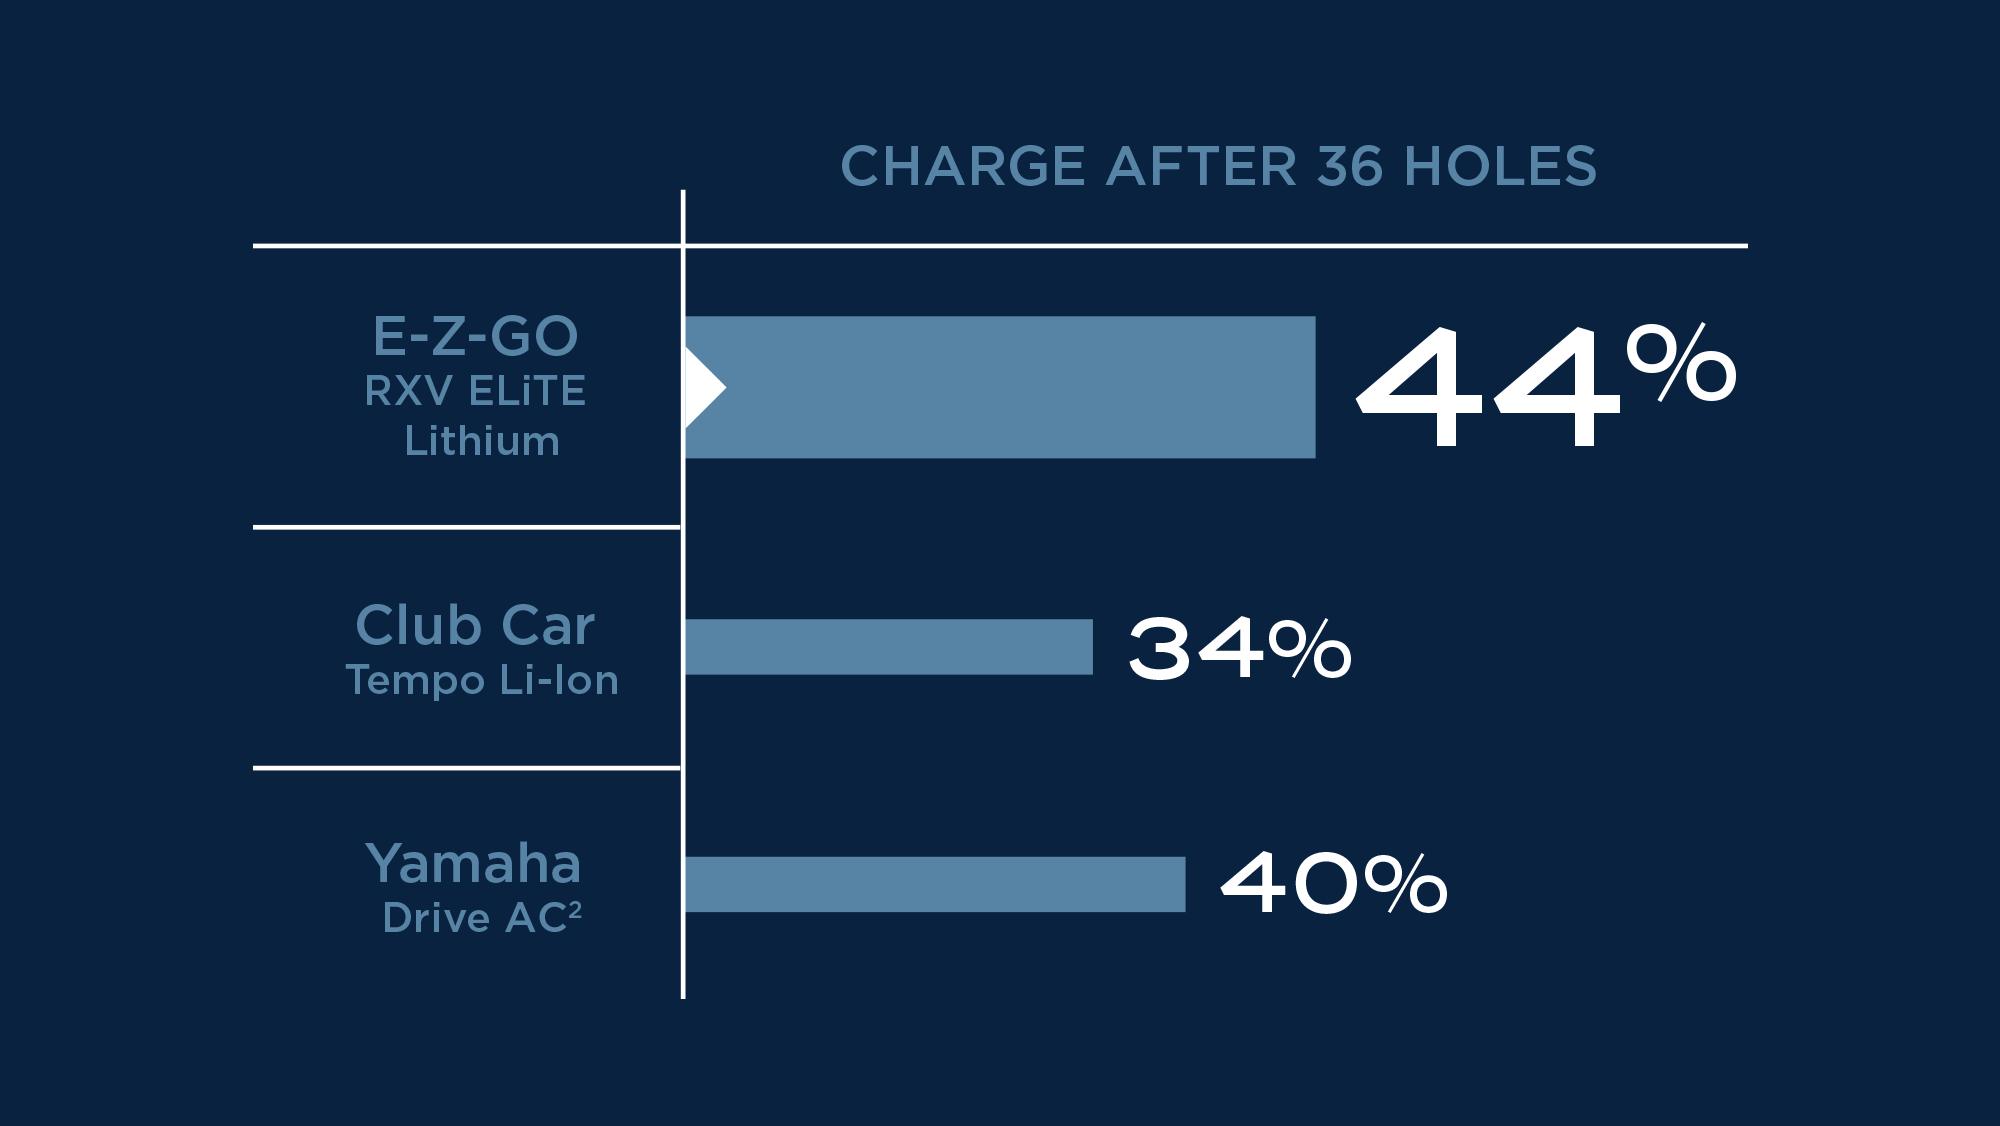 Charge after 36 holes. E-Z-GO RXV ELiTE Lithium 44%. Club Car Tempo Li-Ion 34%. Yamaha Drive AC 40%.